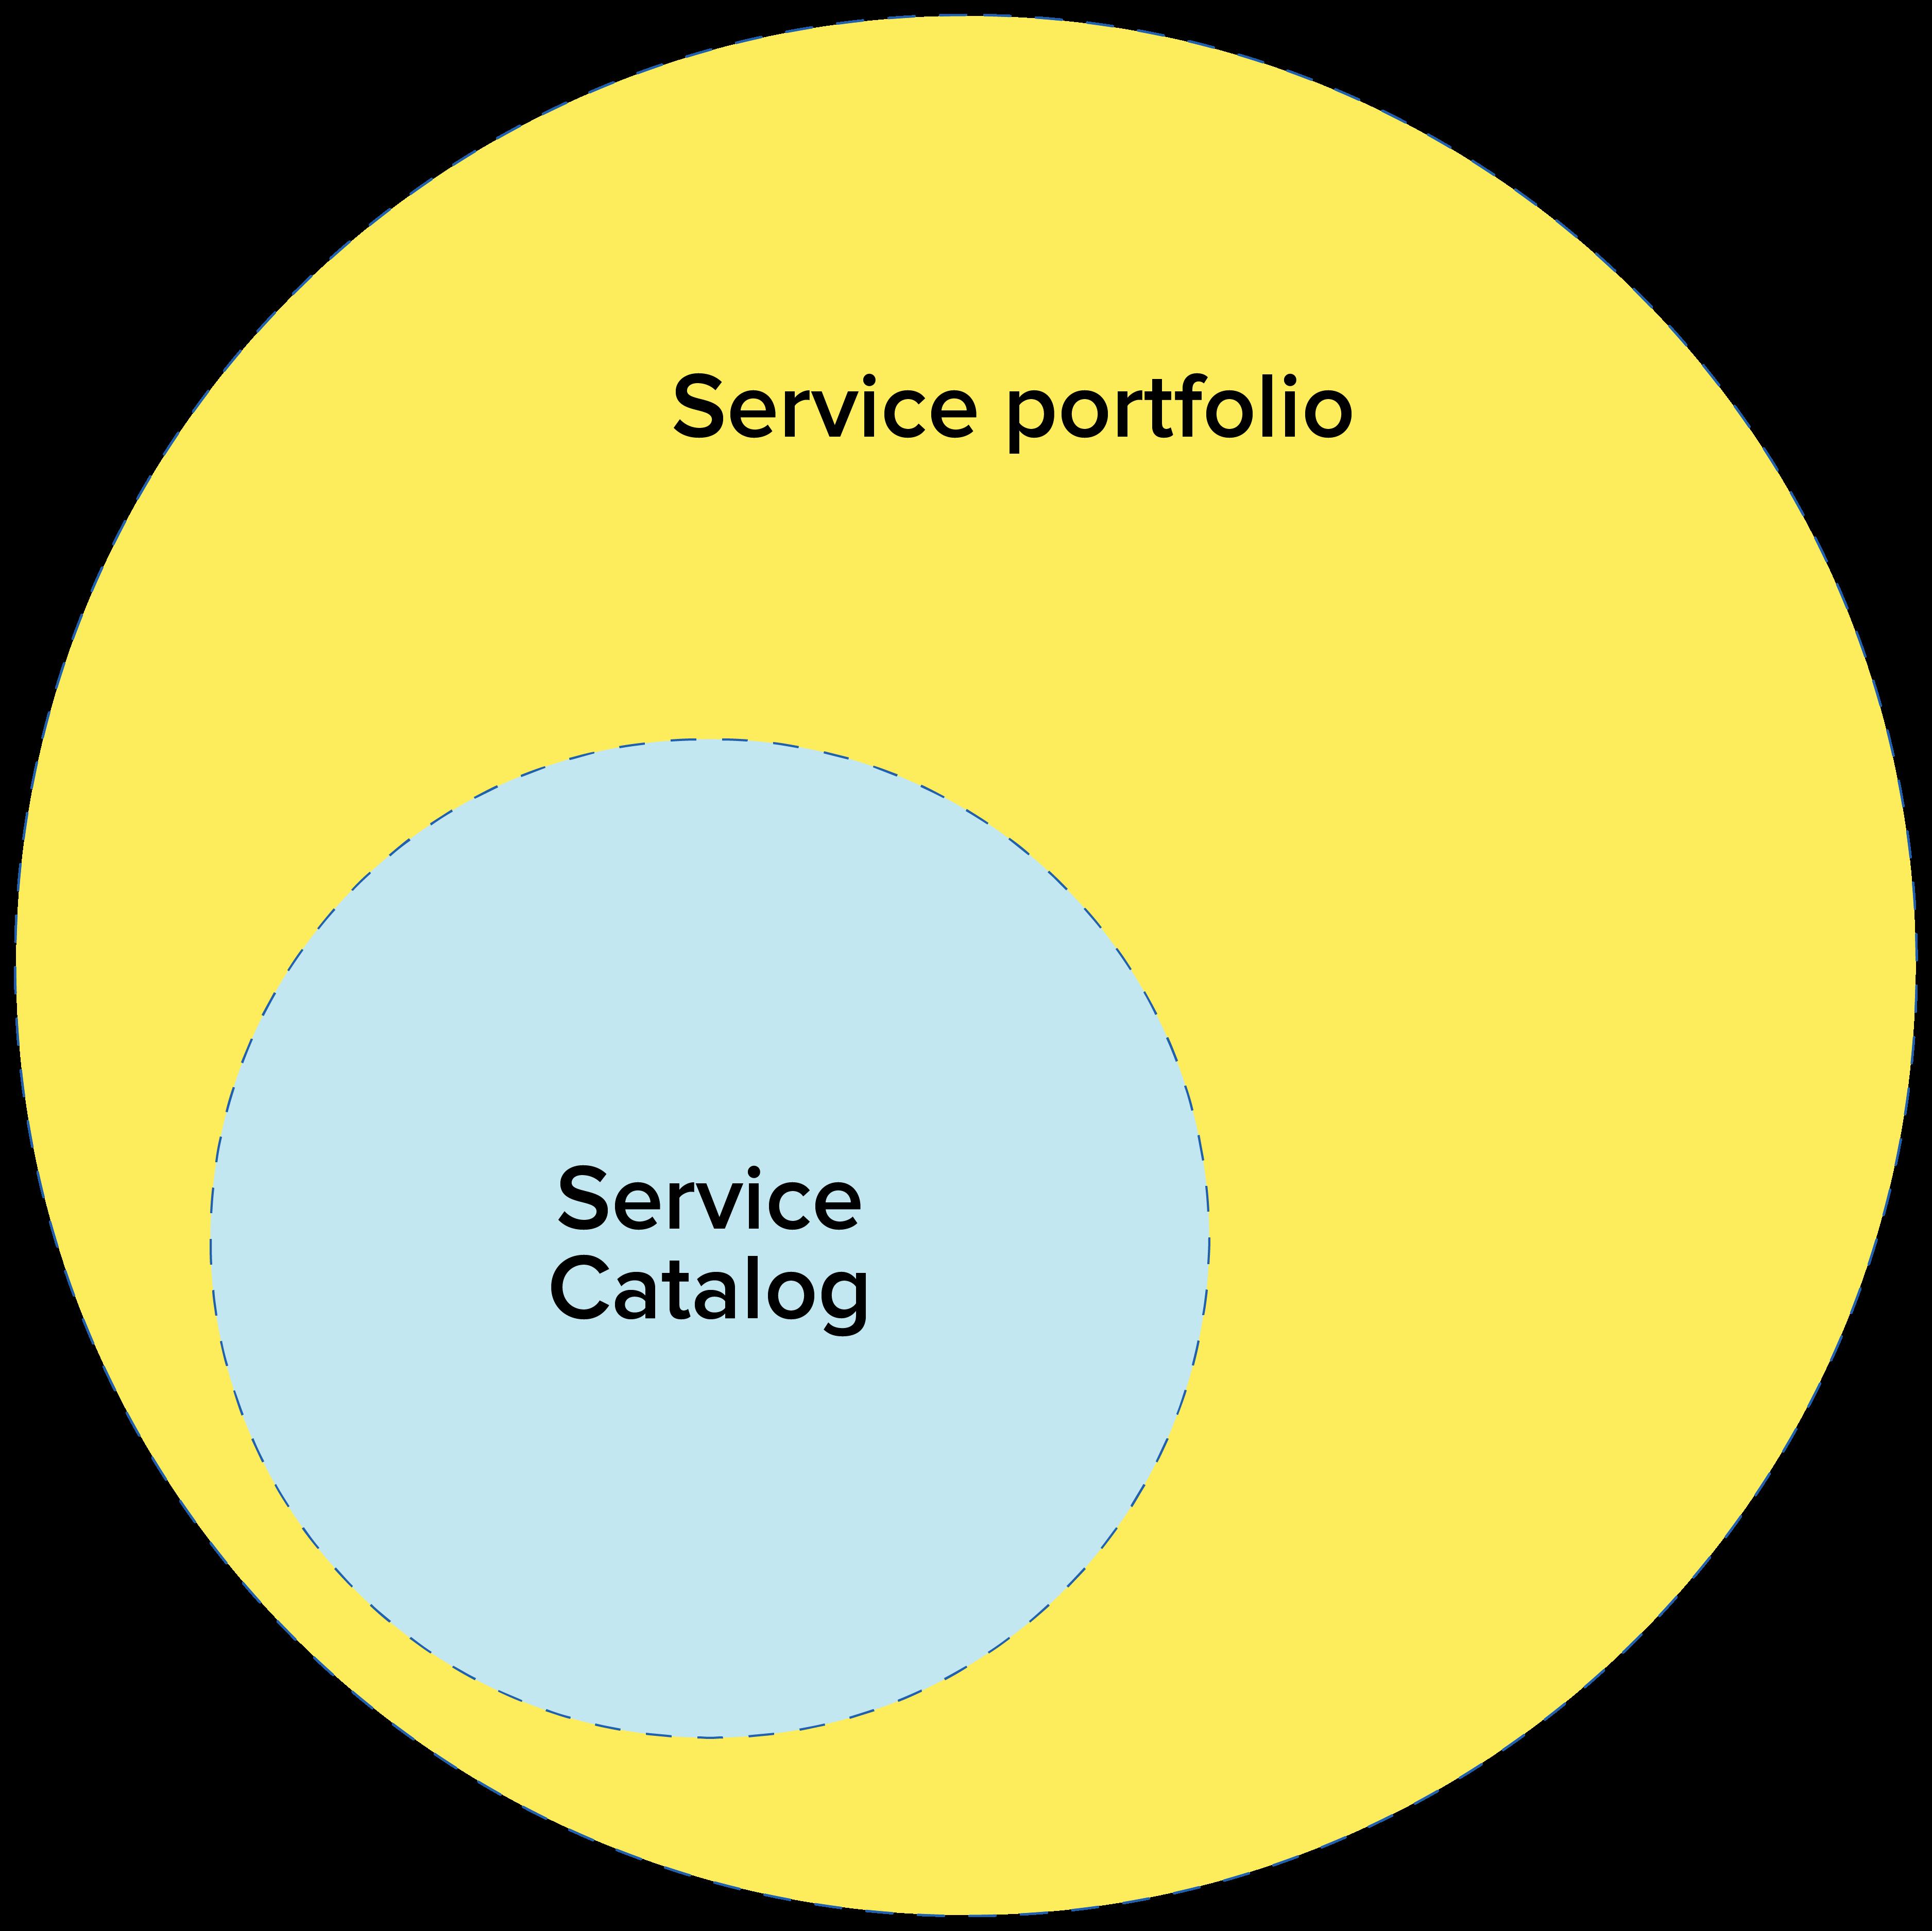 ITIL service portfolio